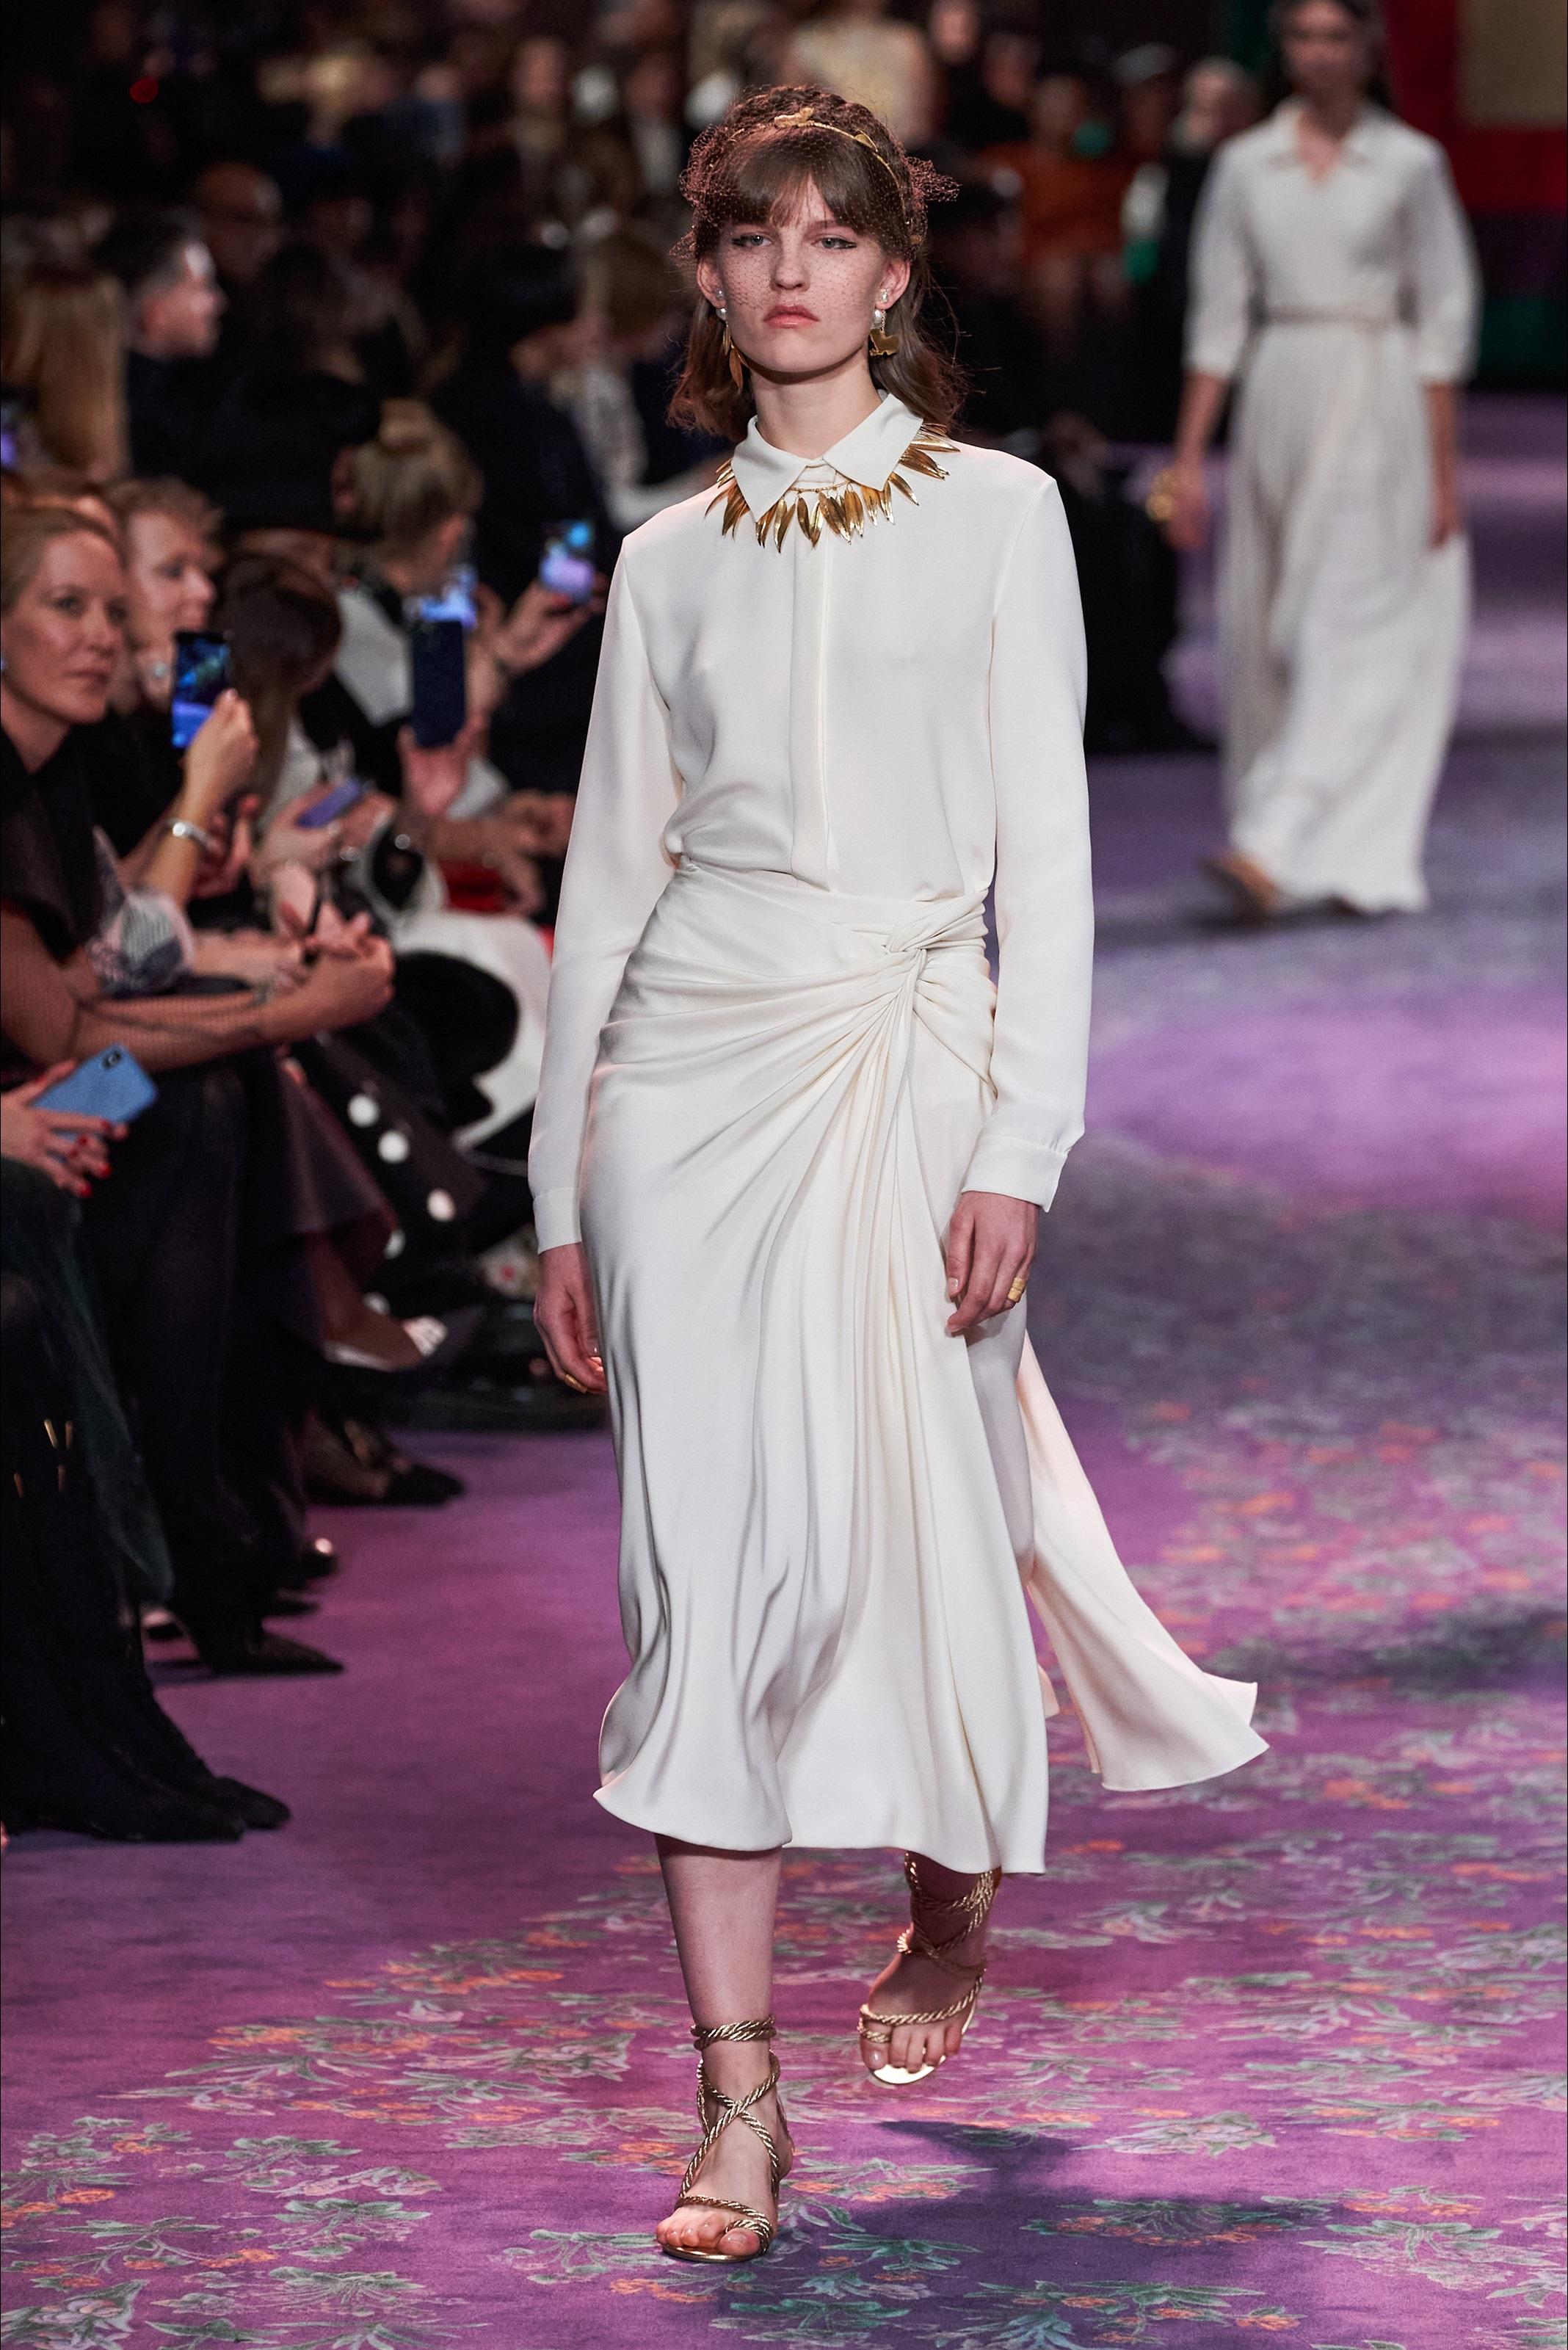 Vestiti Dior 2020 - Neomag.